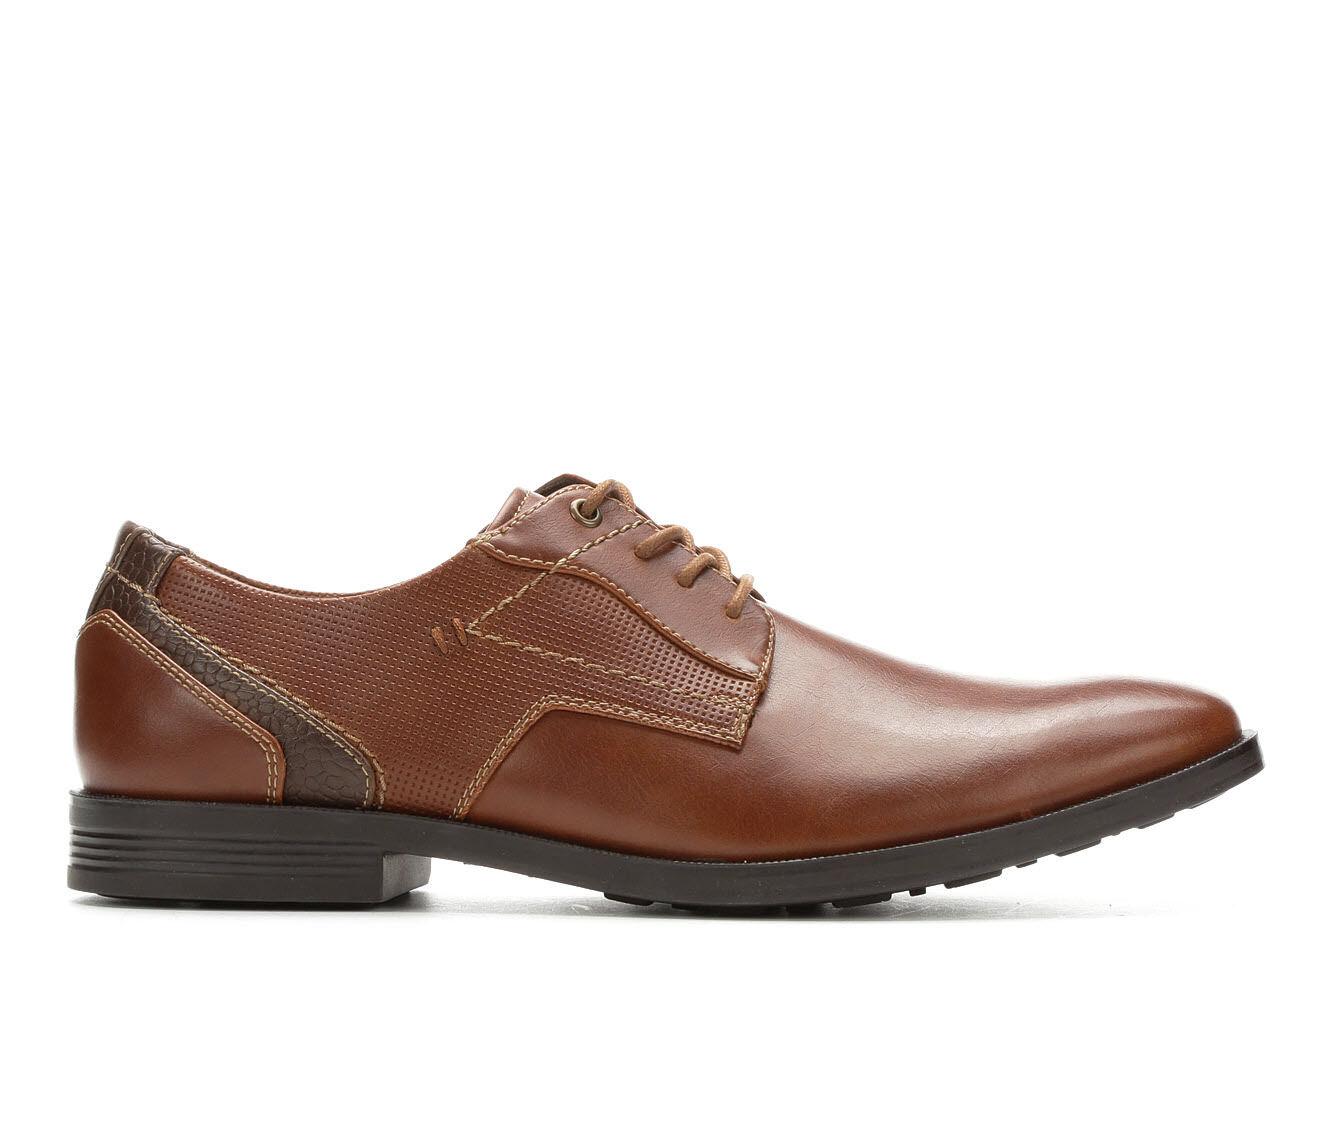 Men's Freeman Mitchell Dress Shoes Tan